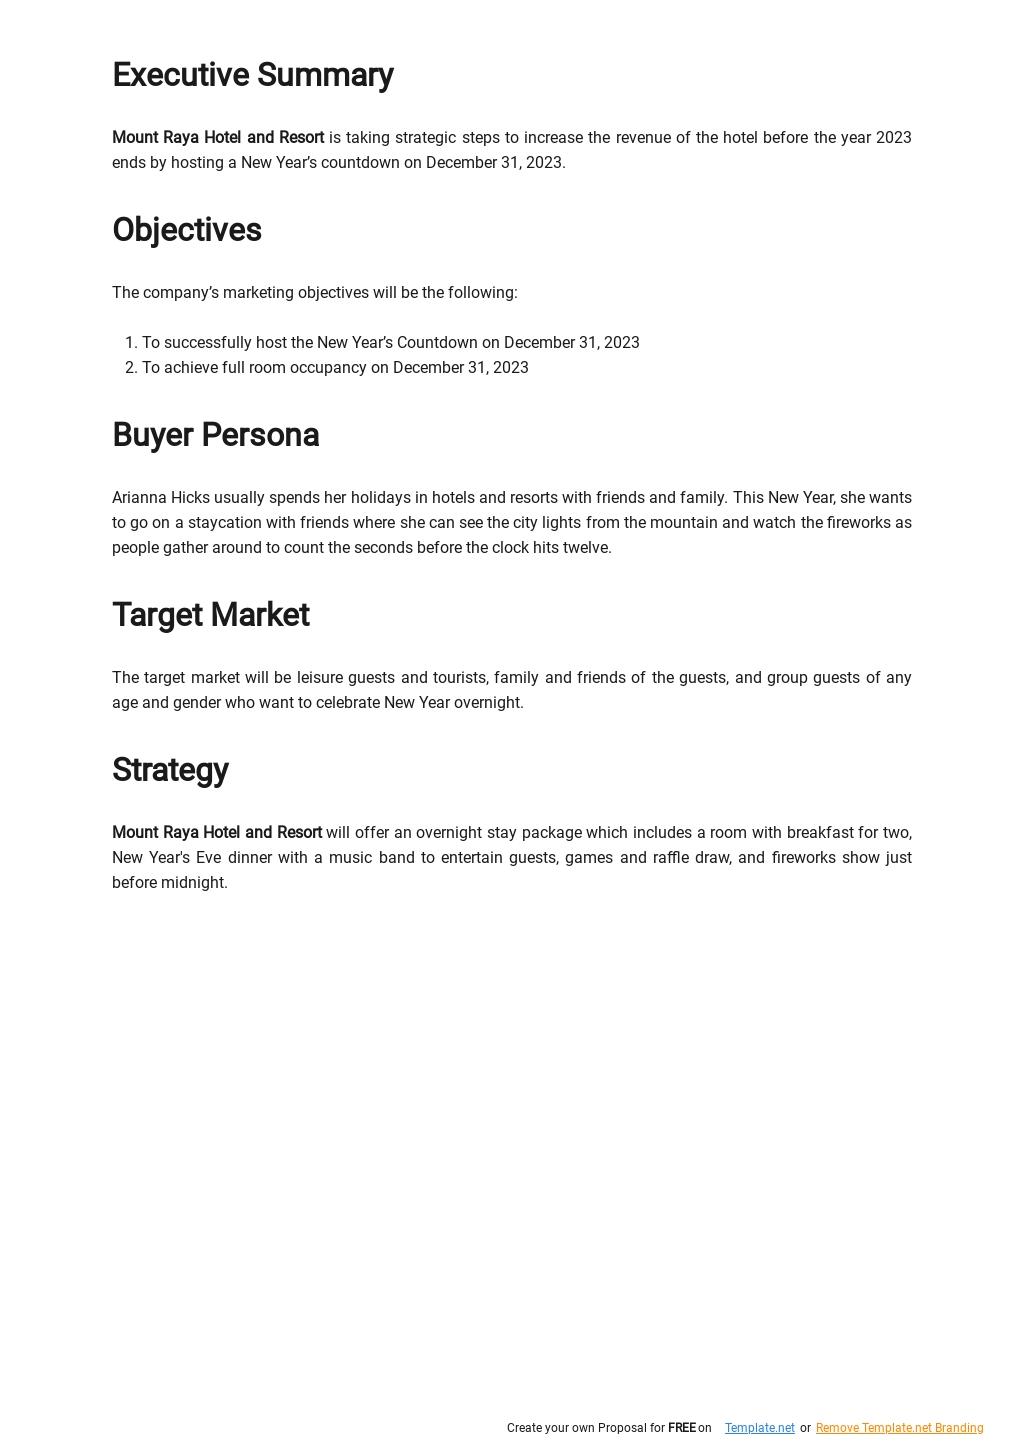 Free Strategic Goals Marketing Plan Template 1.jpe